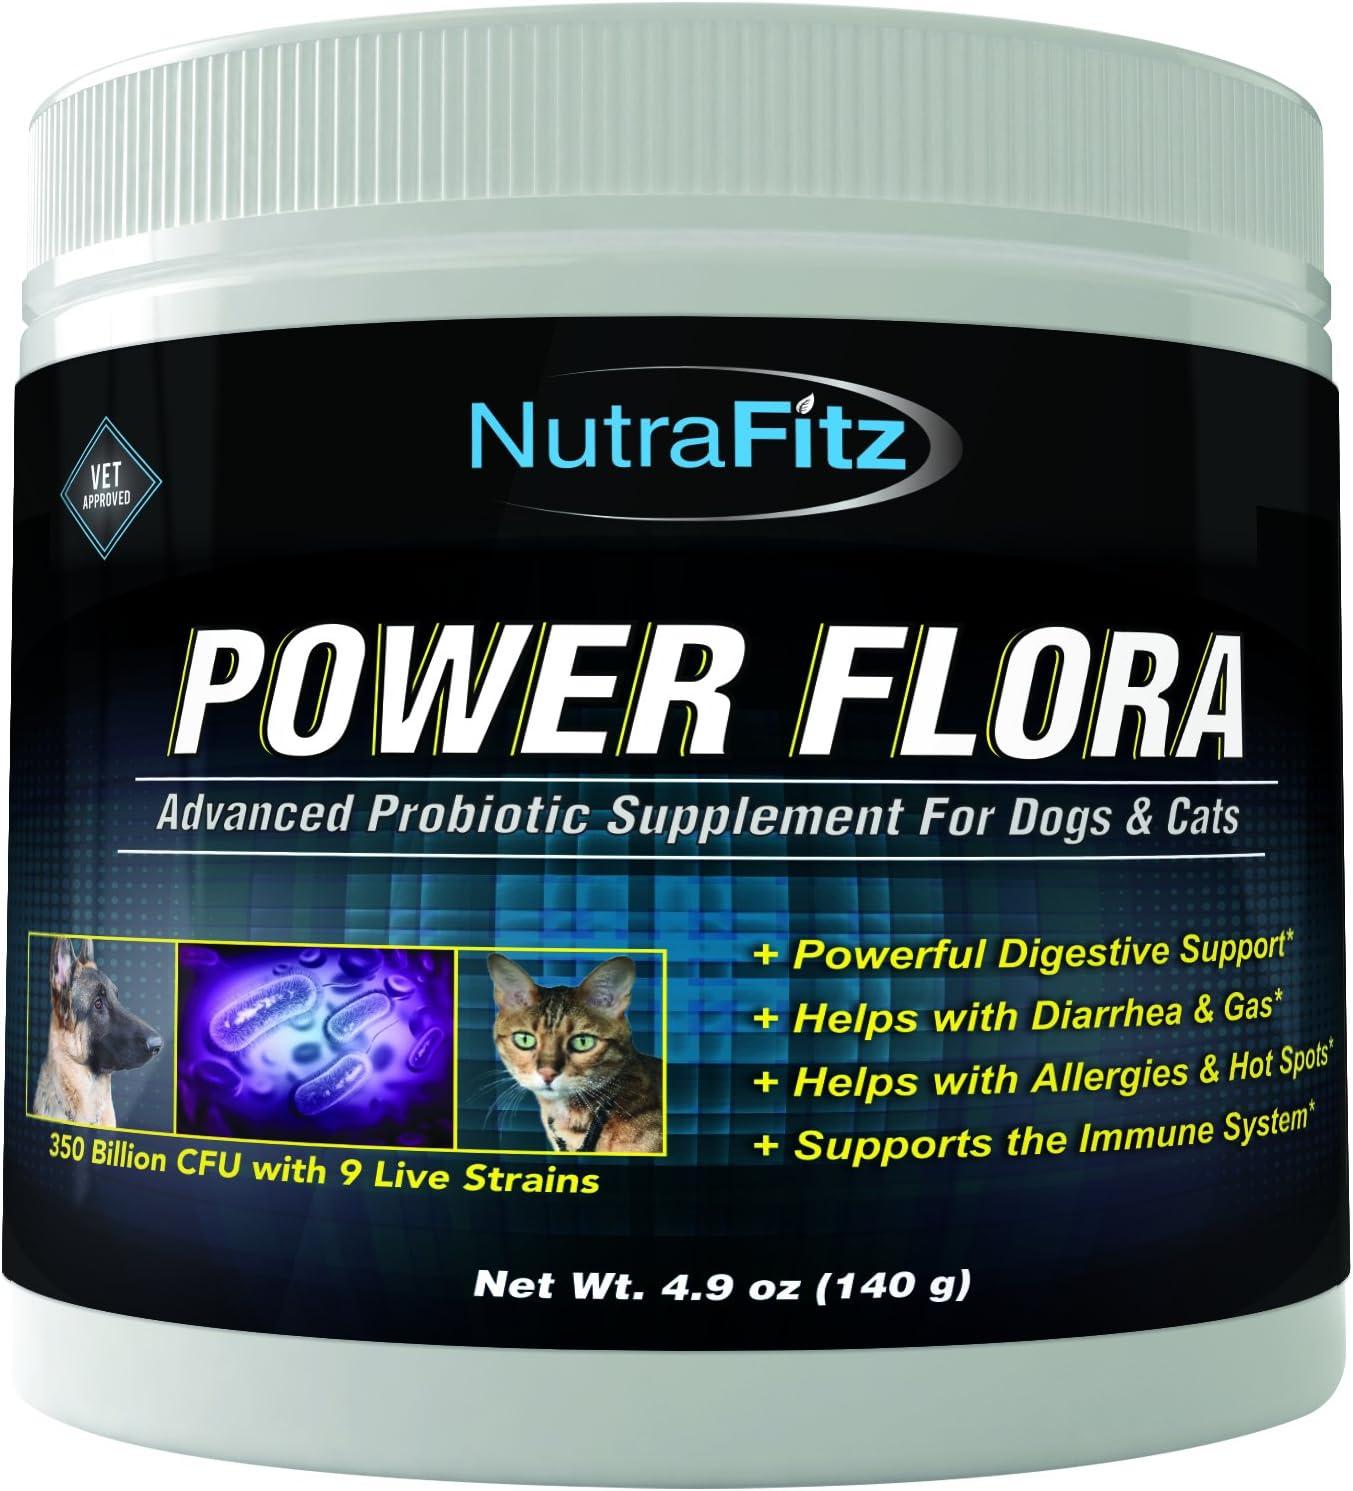 Power Flora by NutraFitz